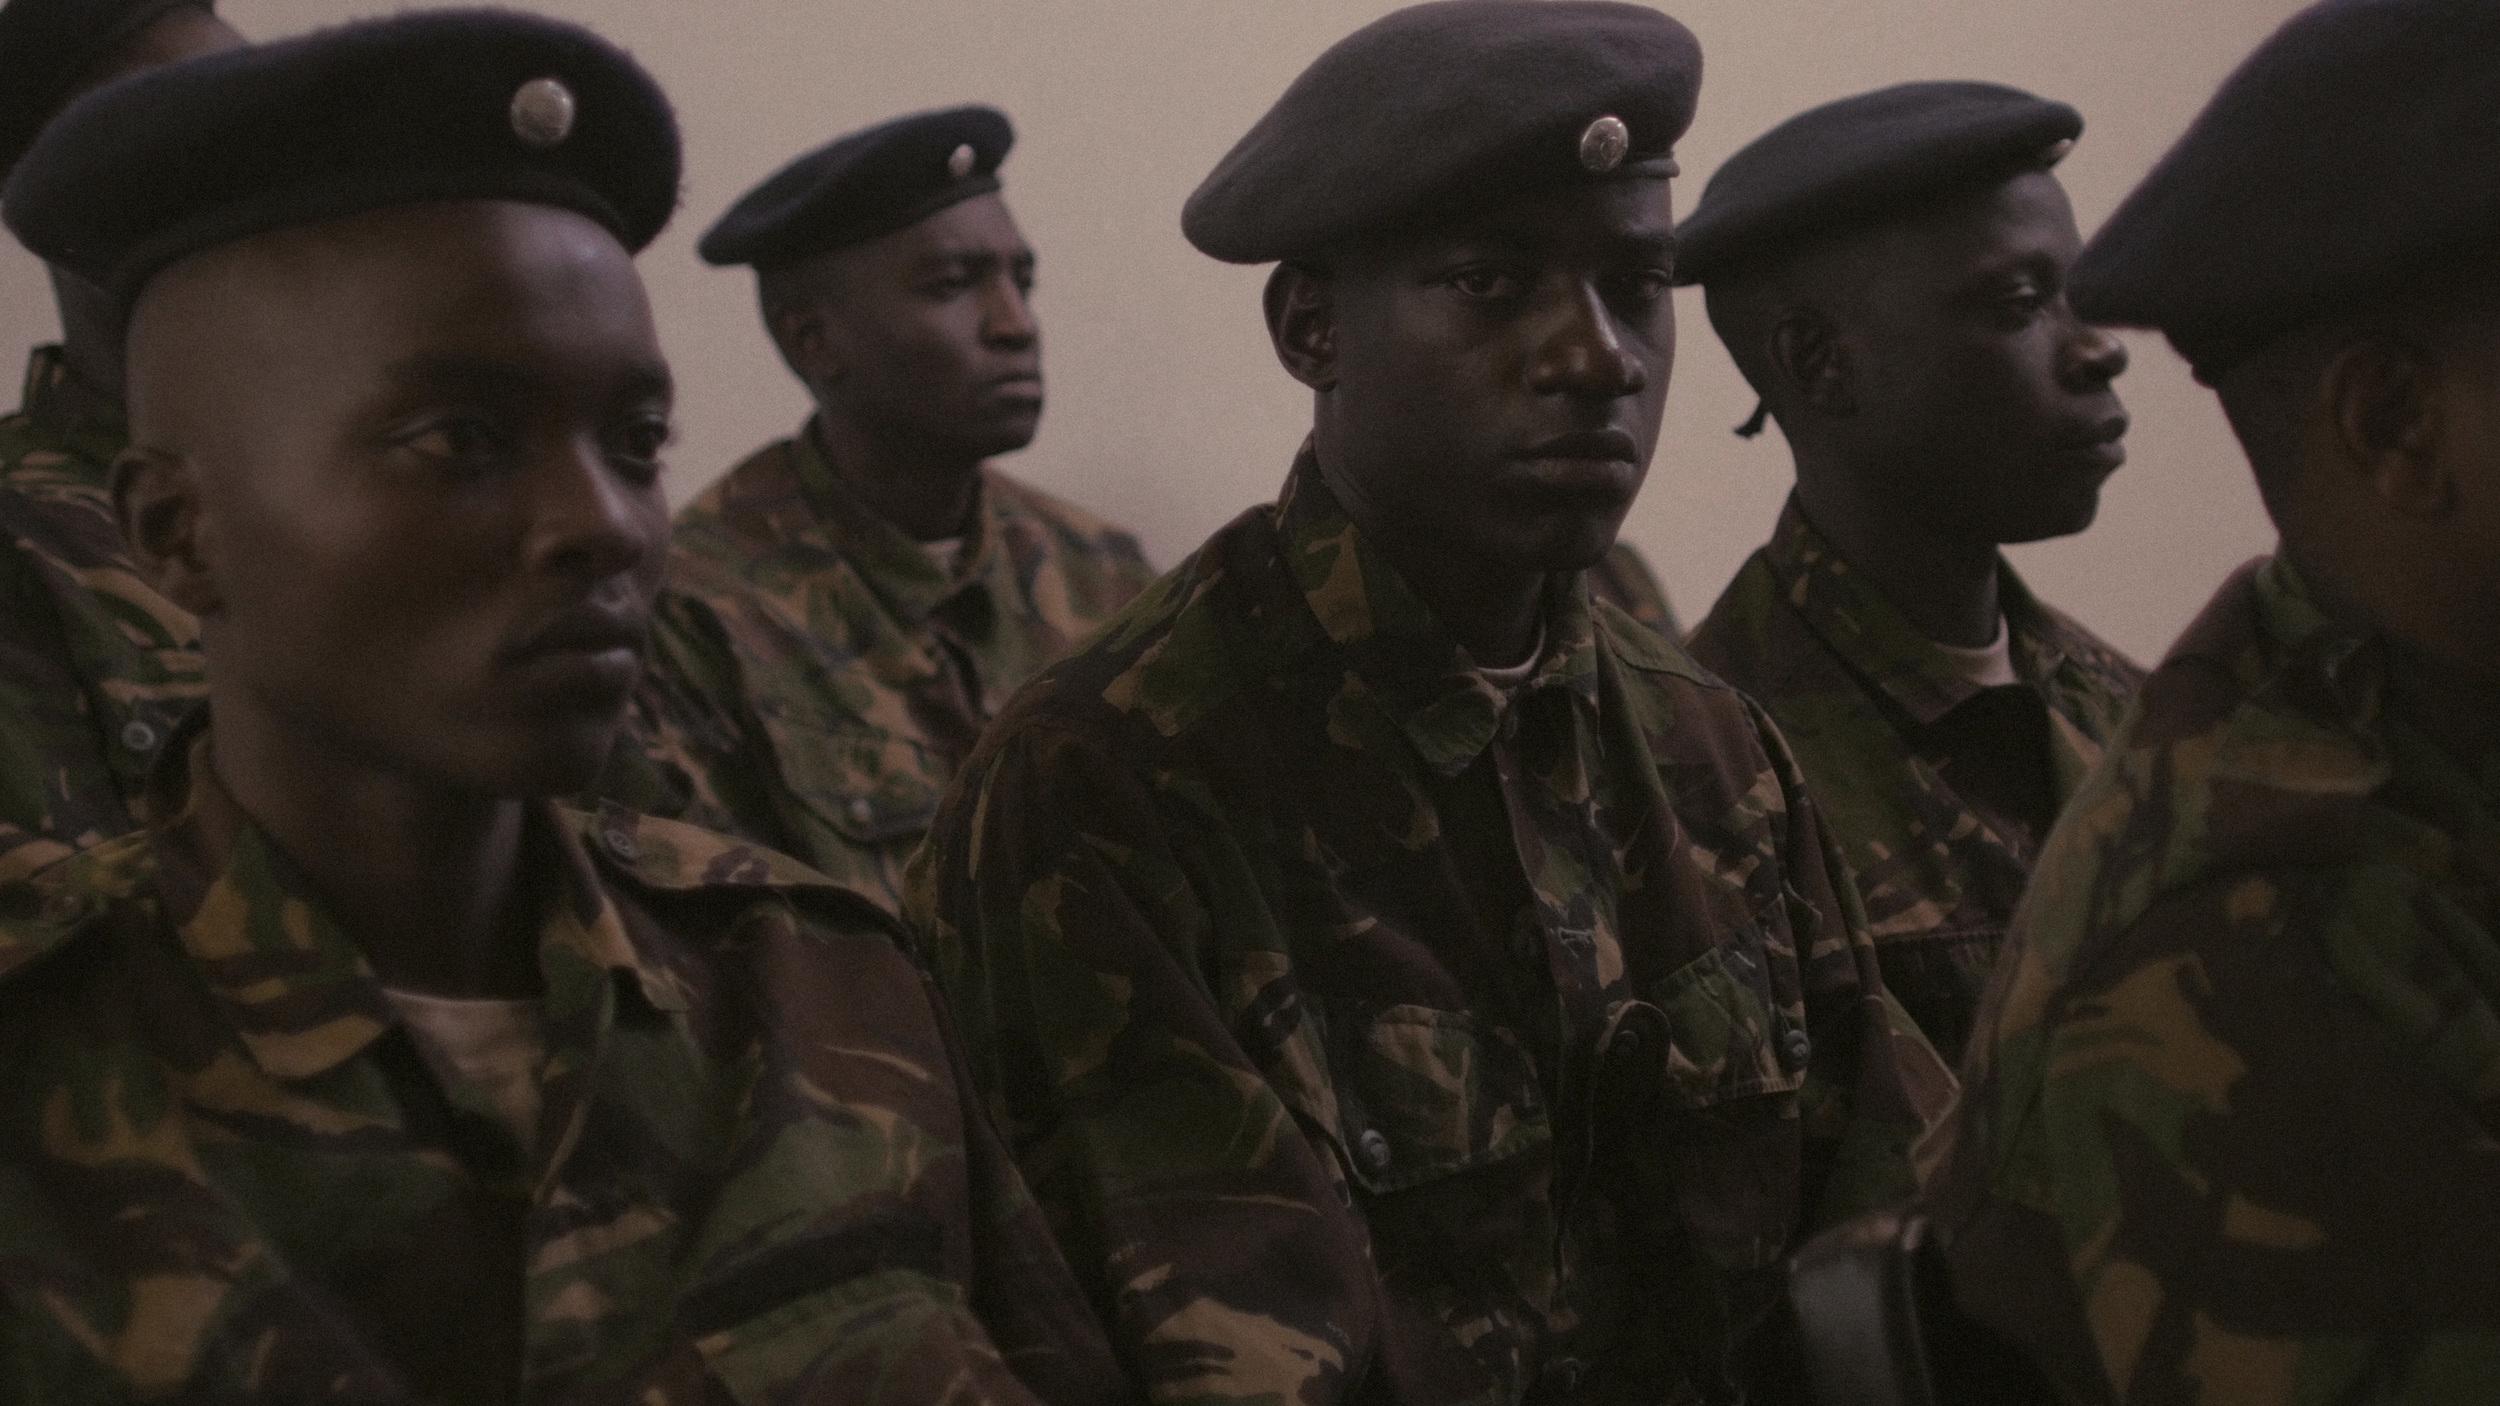 Stevo (Paul Ogola) and fellow officers.